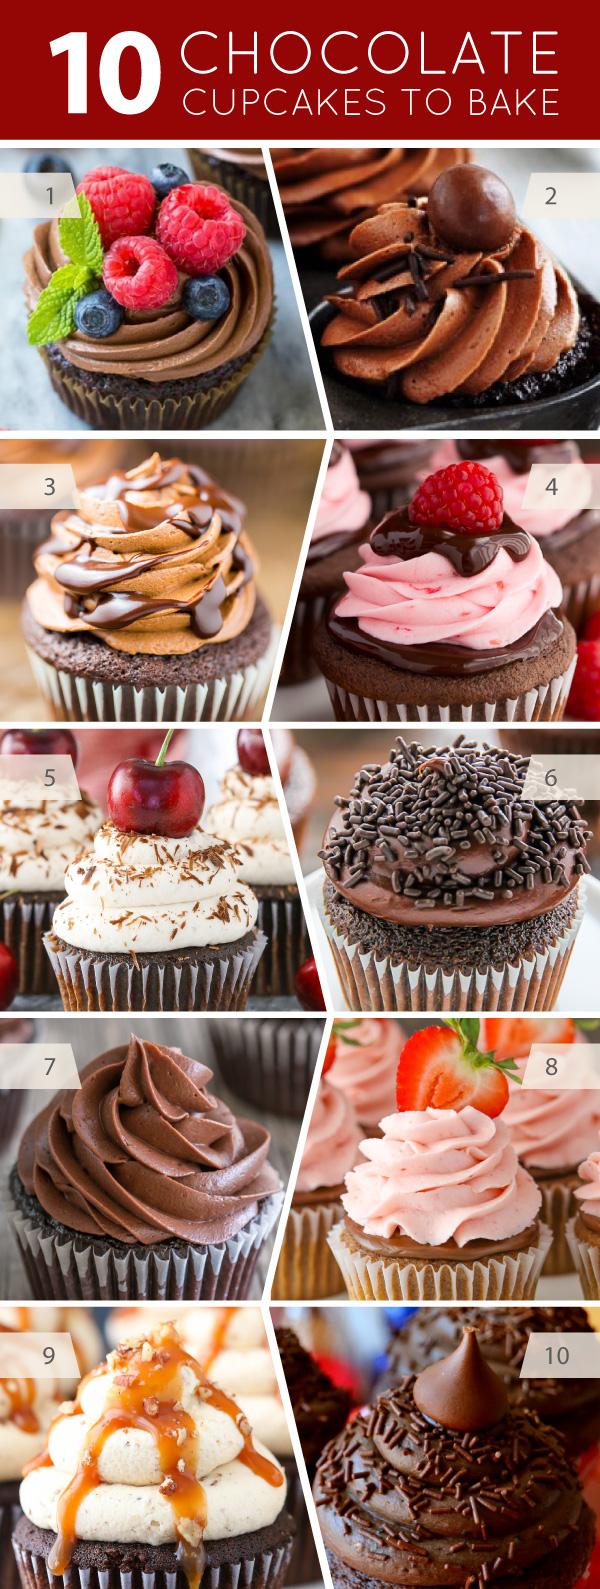 10 Chocolate Cupcakes to Bake - cupcake recipes for serious chocolate lovers | on TheCakeBlog.com